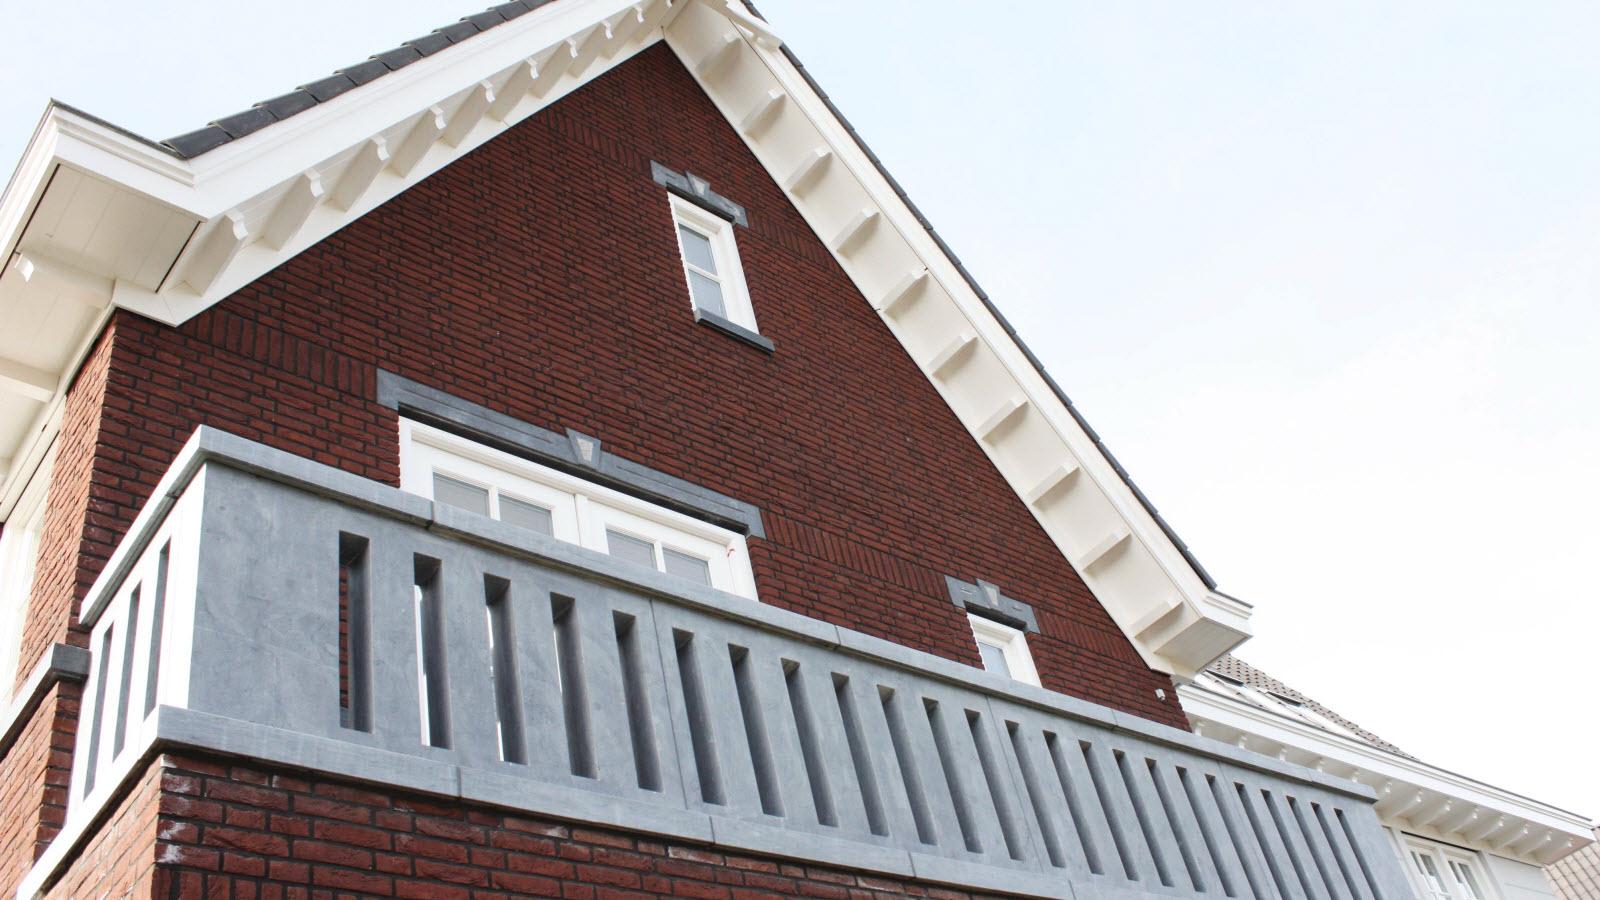 Parkhagen Sint Michielsgestel (5)